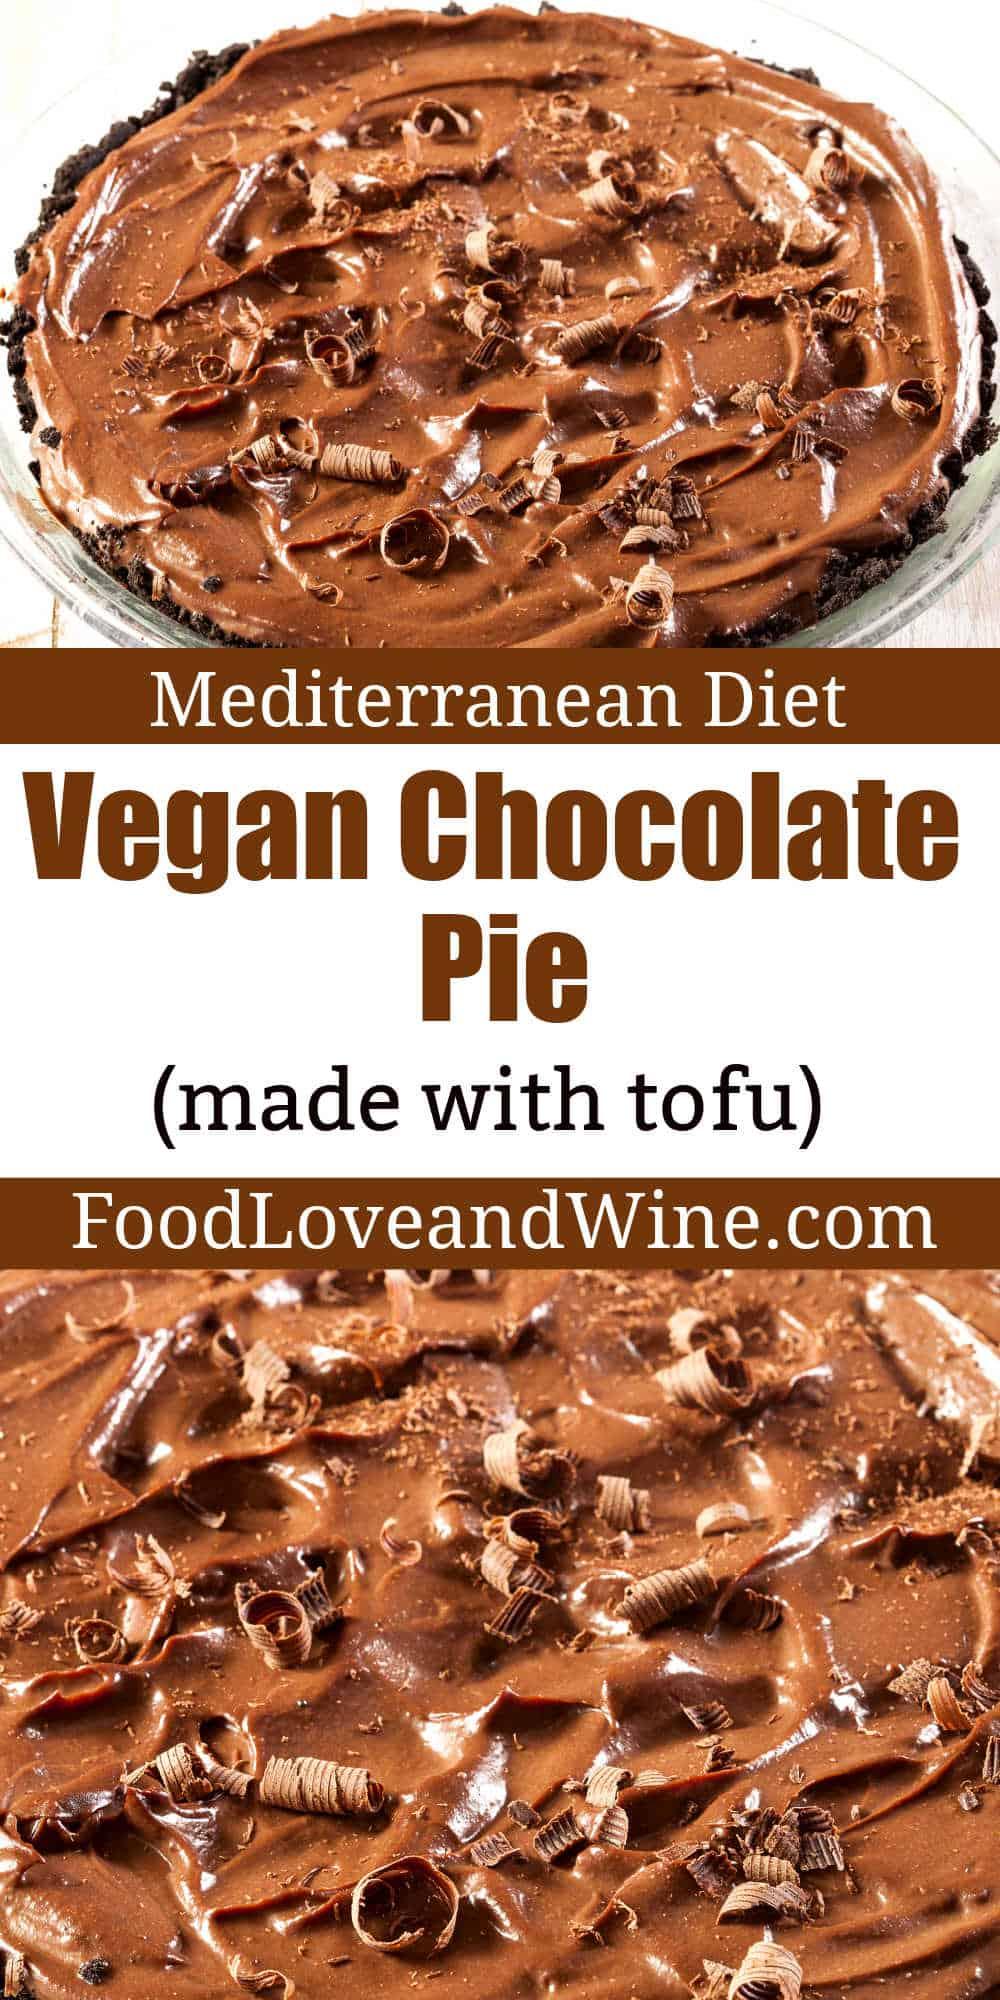 Homemade Vegan Chocolate Tofu Pie